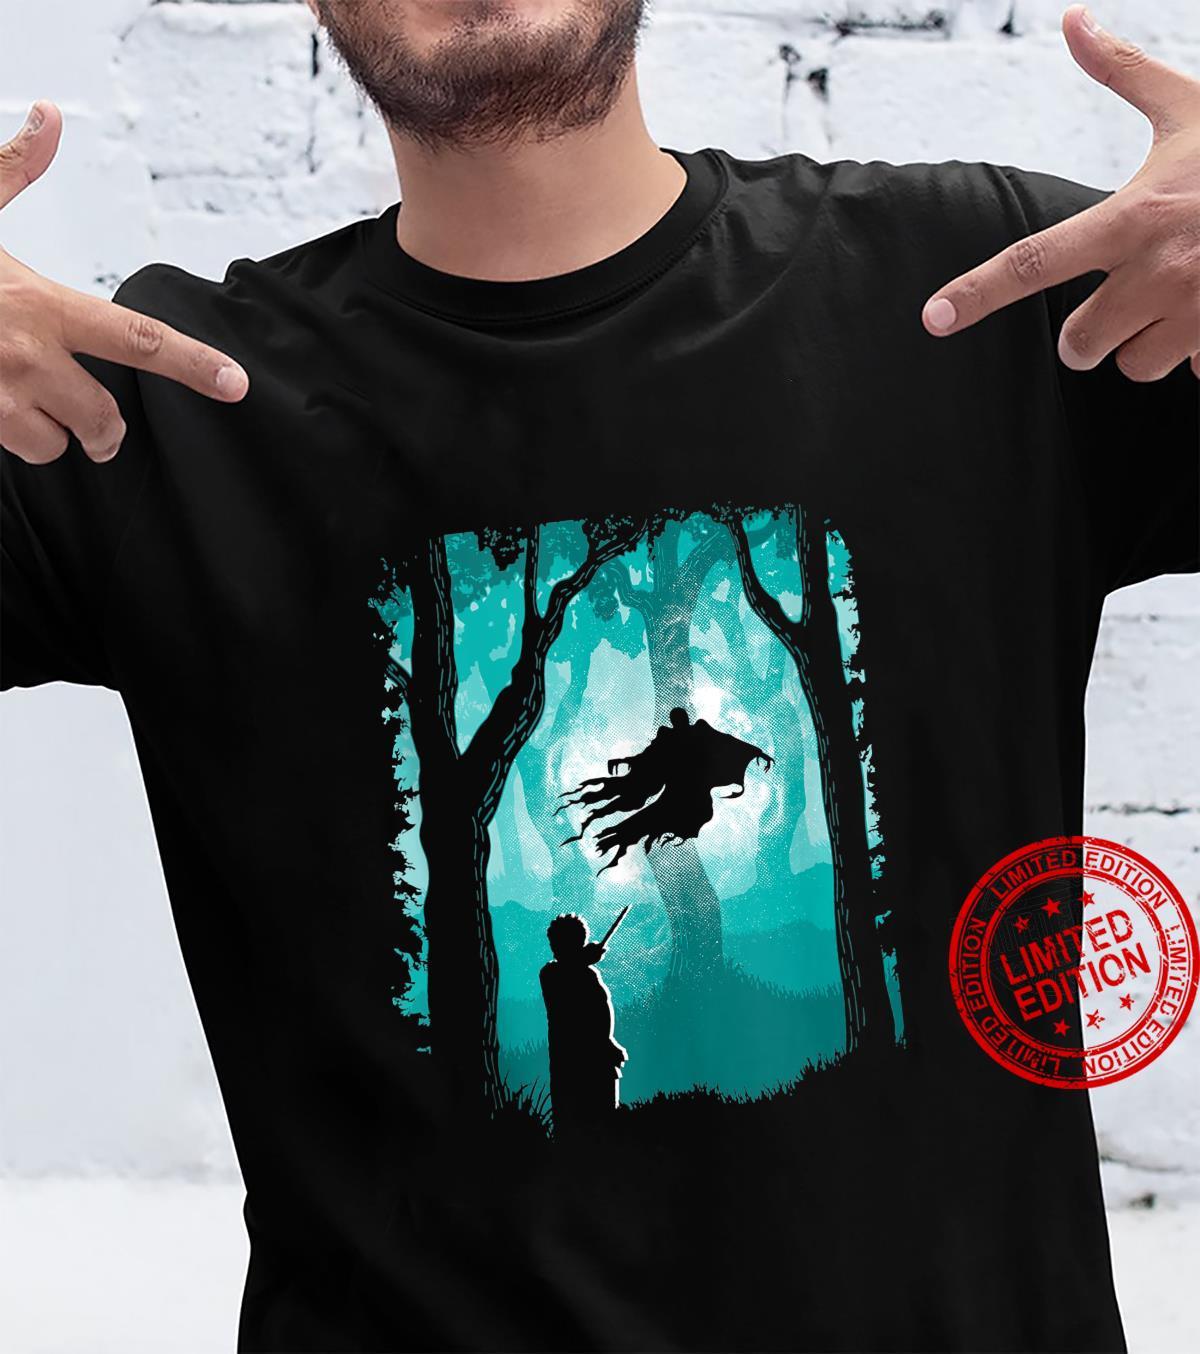 Return Of The Soulless Shirt